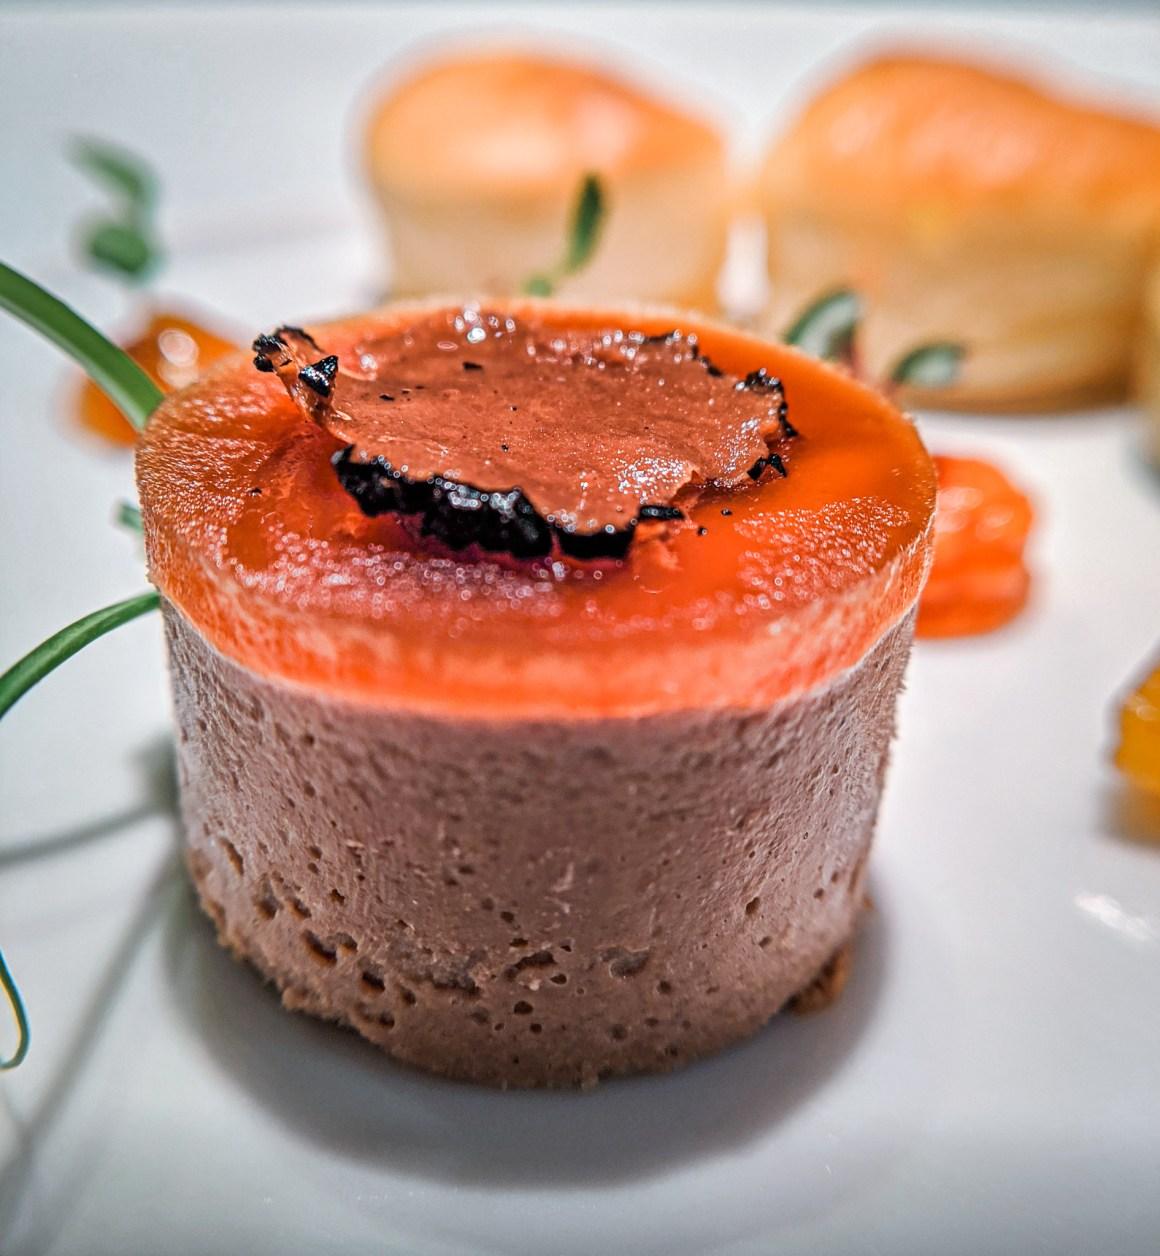 #EyesForLuxury, aperol spritz, barley risotto, bordeaux, Chef Matteo Fontana, chilean sea bass, creme brulee, duck liver, duck ravioli, EyesForDining, Fine Dining, french, gin and tonic, italian, le cirque, le cirque new delhi, mushroom cappucino, naina redhu, naina.co, Pork belly, restaurant, scallops, the leela, The Leela Palace New Delhi, tiramisu